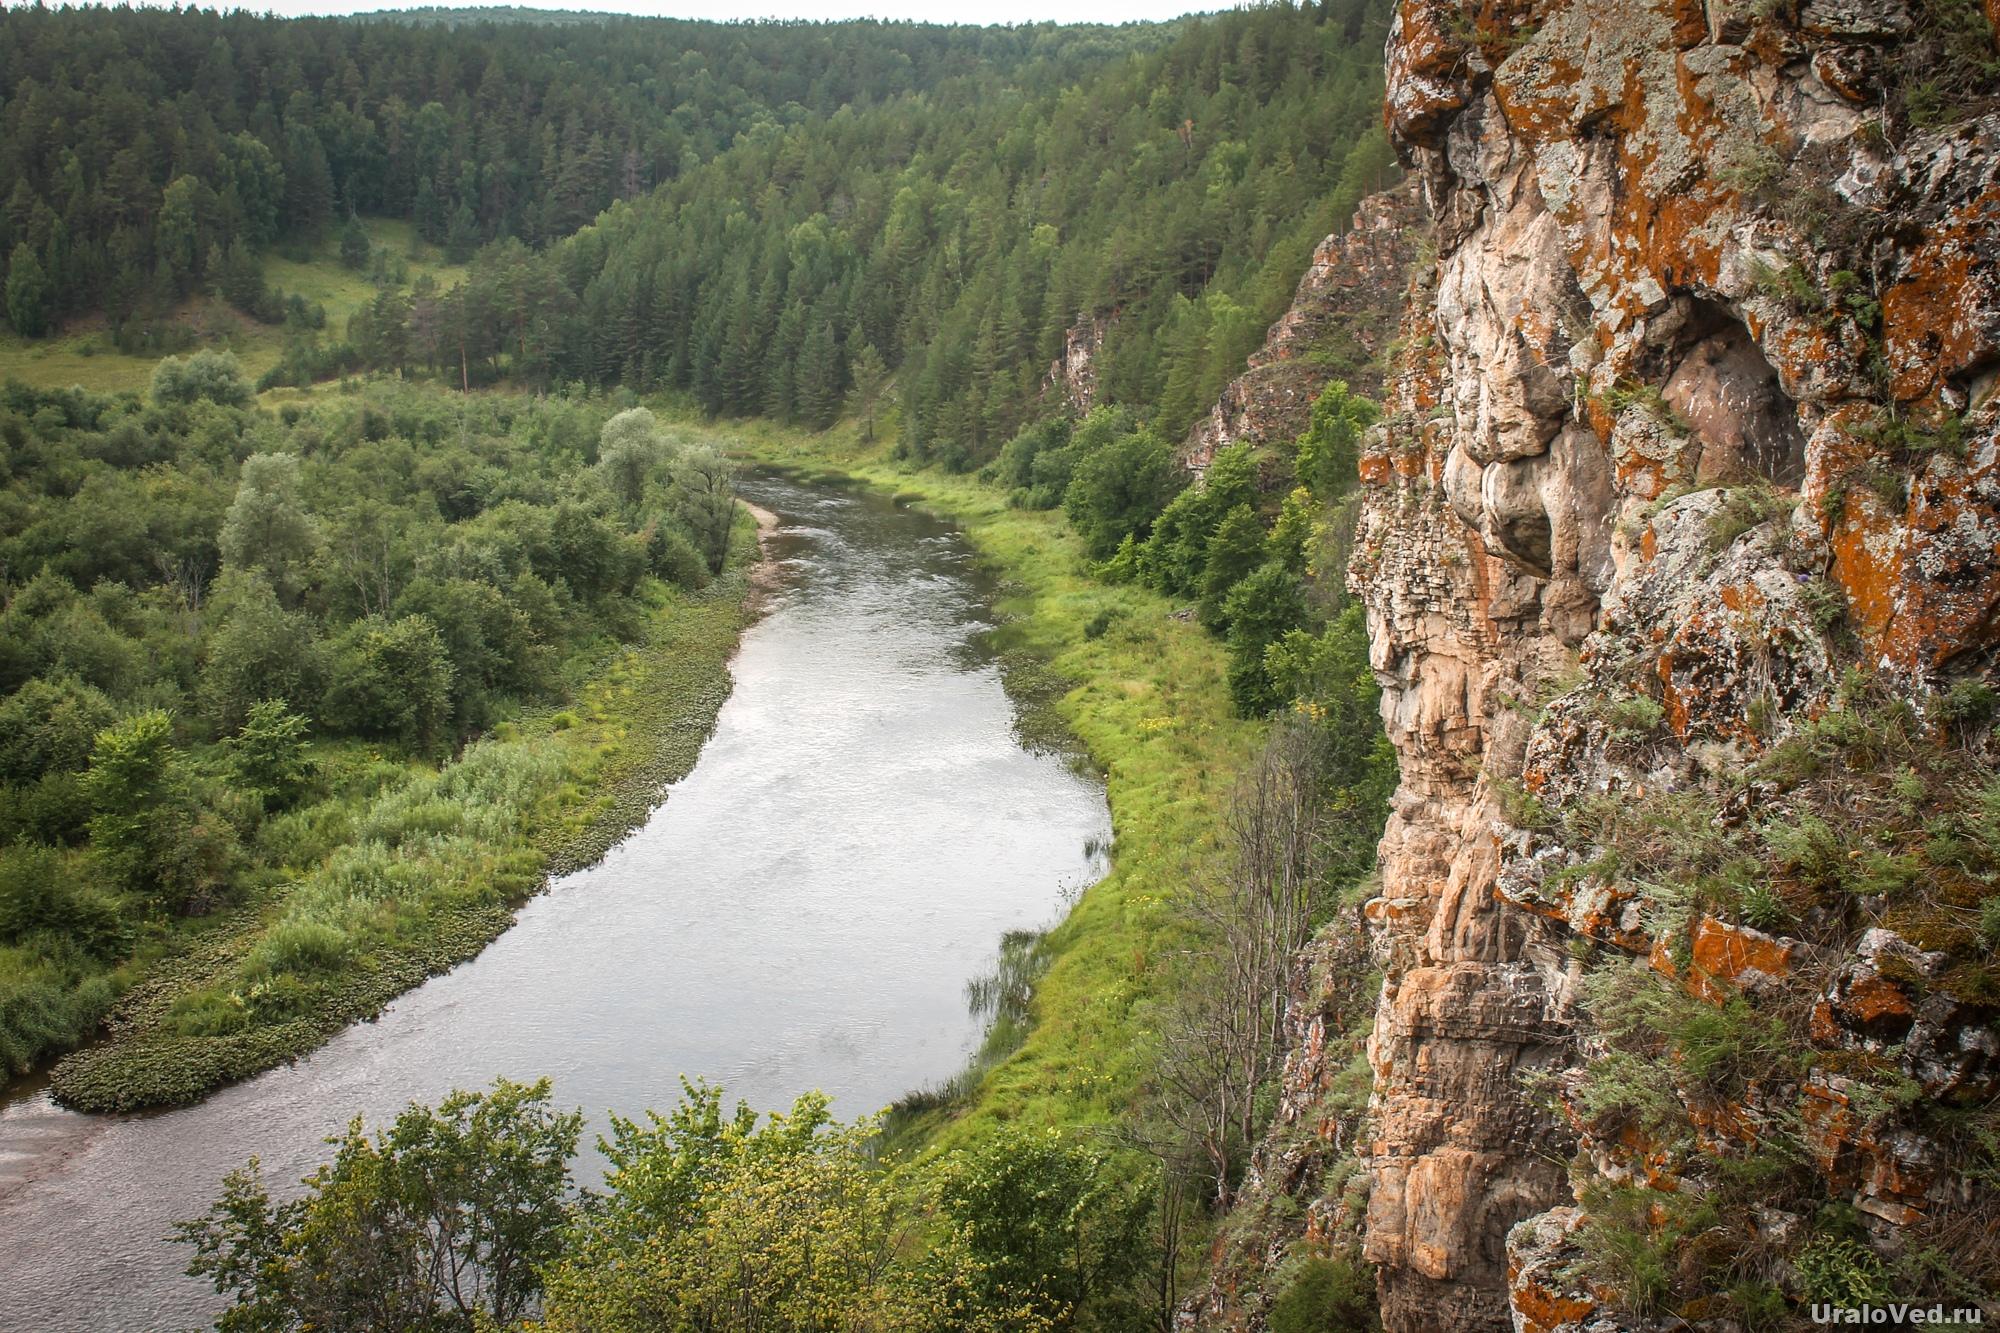 Марьин утёс (Хапов гребень) на реке Катав